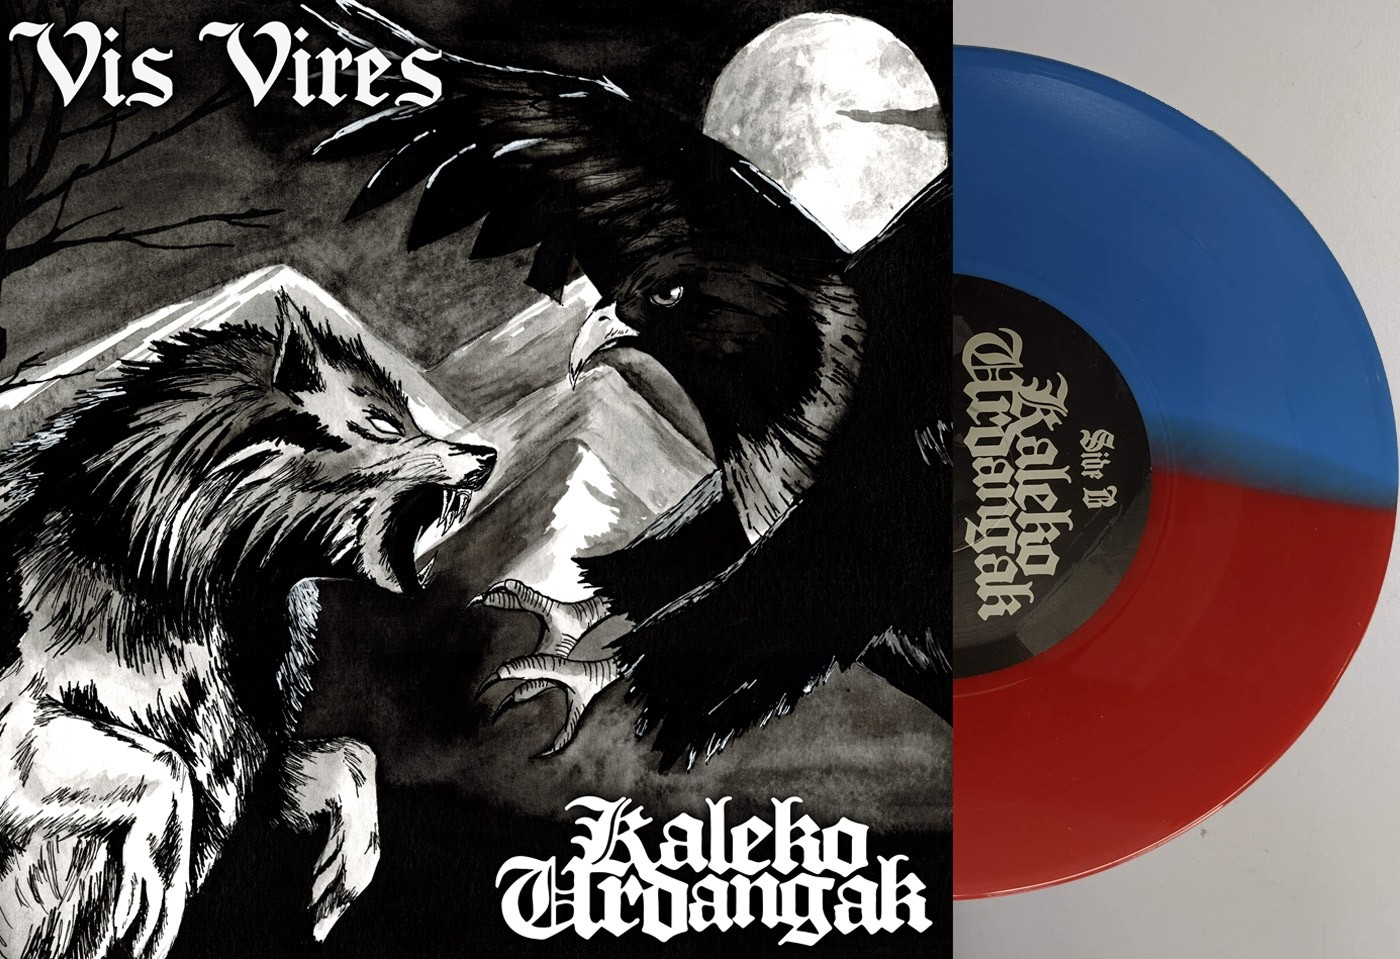 "V/A Vis Vires / Kaleko Urdangak - Split 7""EP lim.150 half n half"